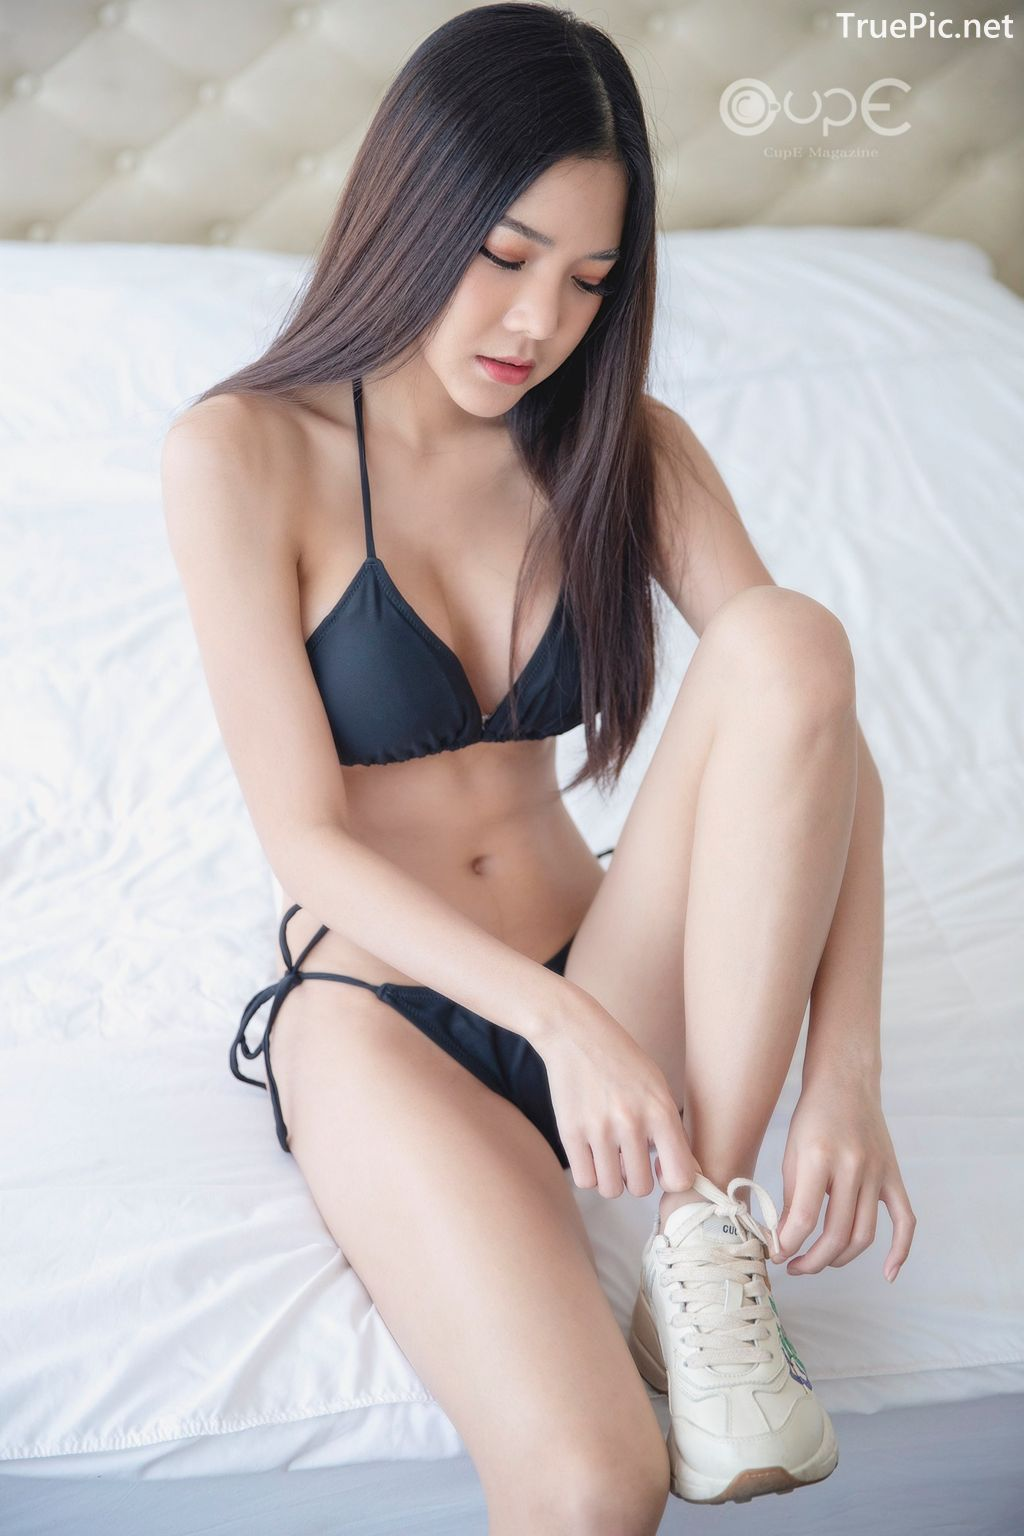 Image-Thailand-Model-Phitchamol-Srijantanet-Black-Bikini-TruePic.net- Picture-10